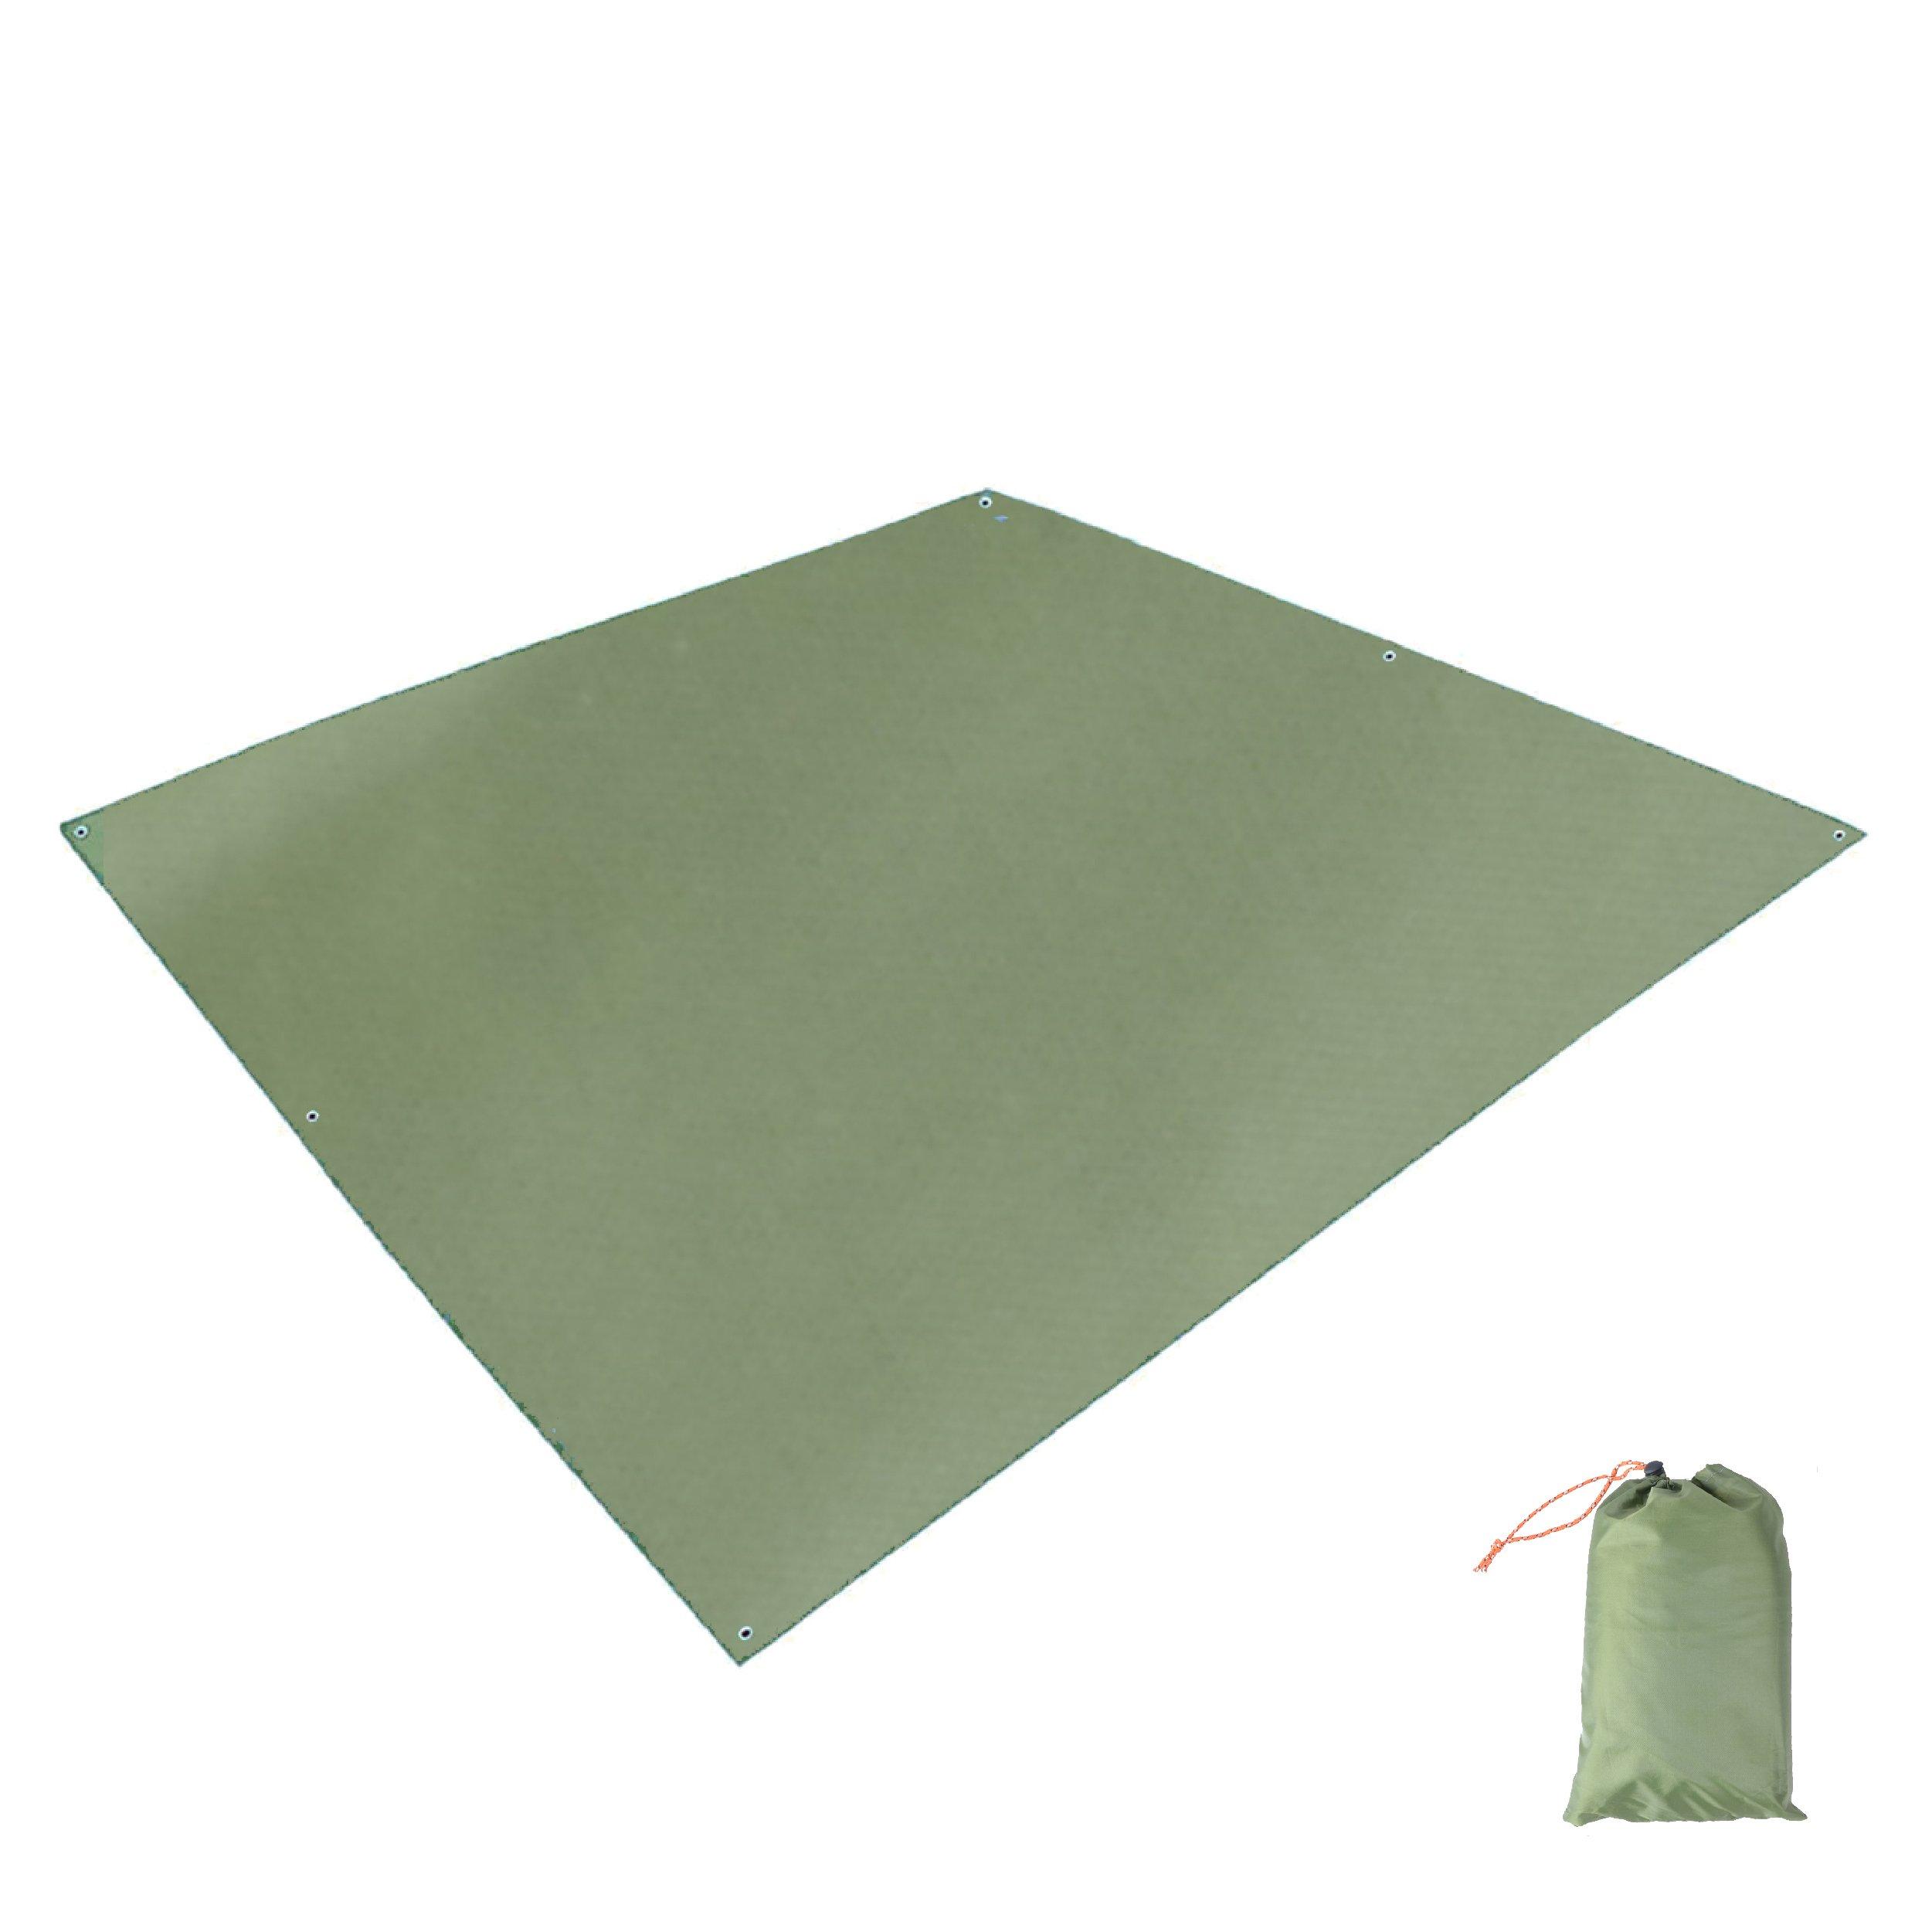 TRIWONDER Waterproof Rain Fly Hammock Camping Shelter Tent Tarp Footprint Sunshade Mat for Hiking Backpacking Beach Picnic (Green - 84.6 x 84.6 inches) by TRIWONDER